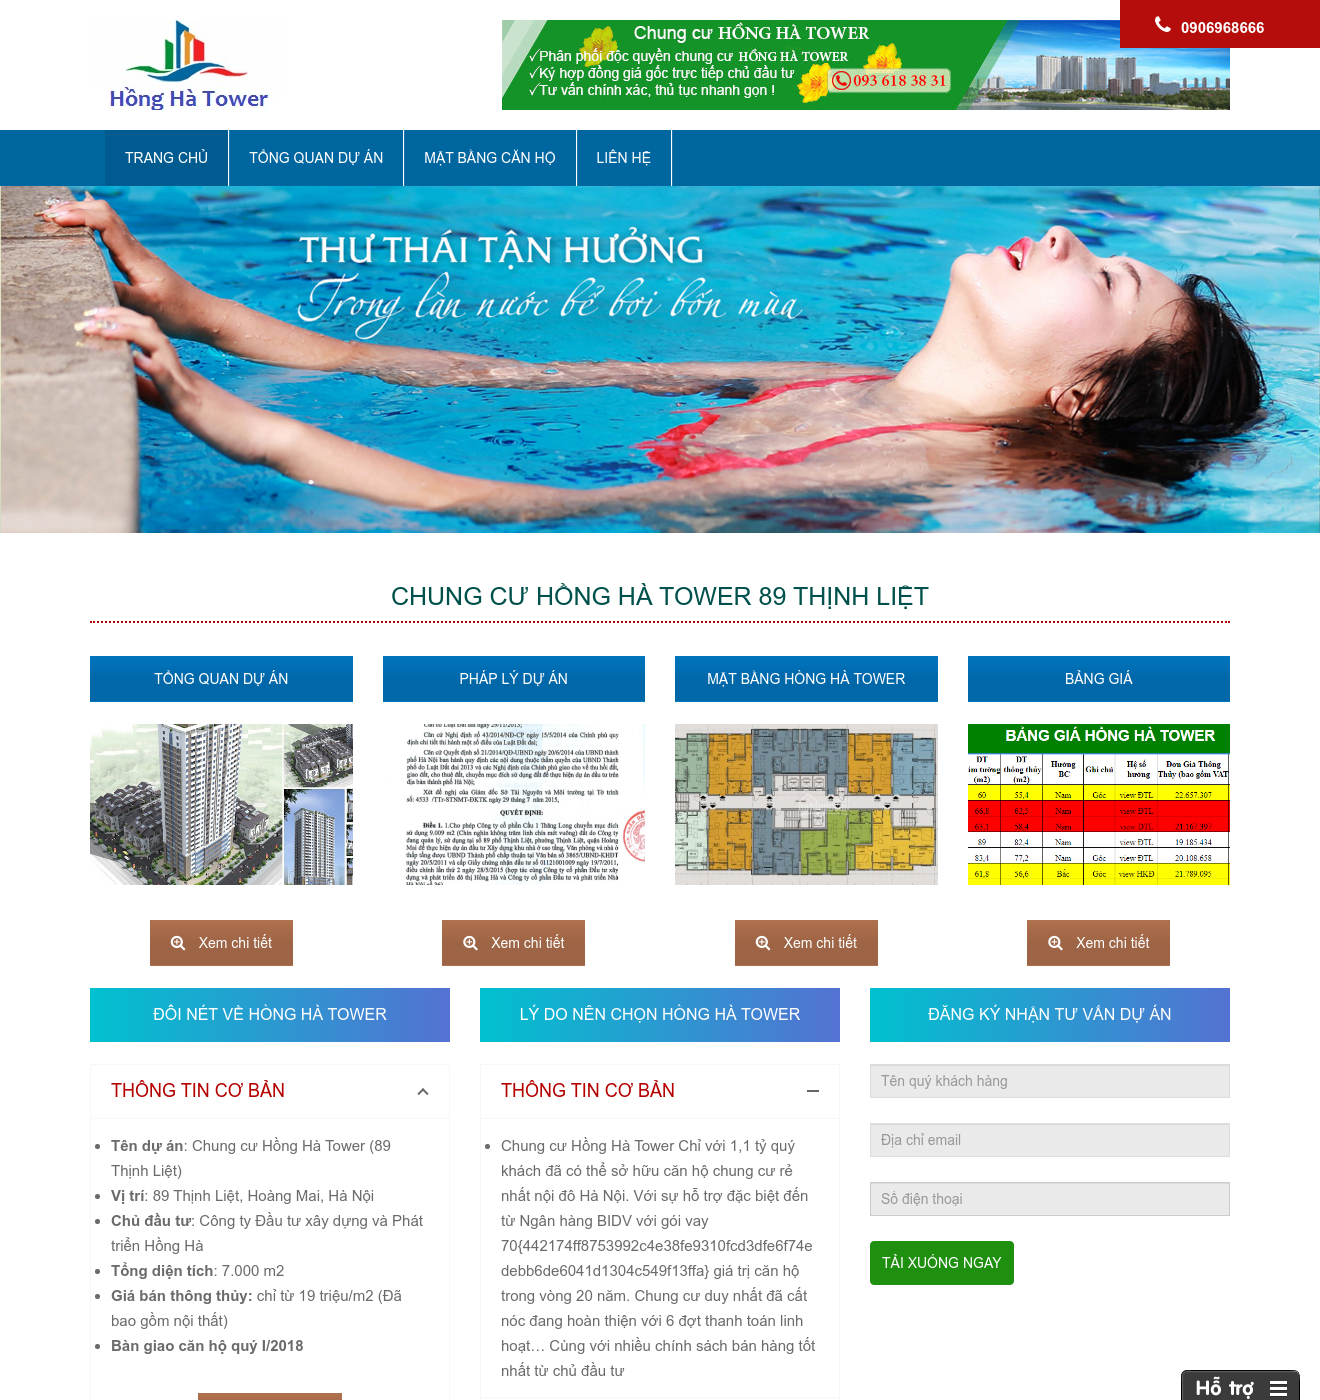 Website bất động sản 18